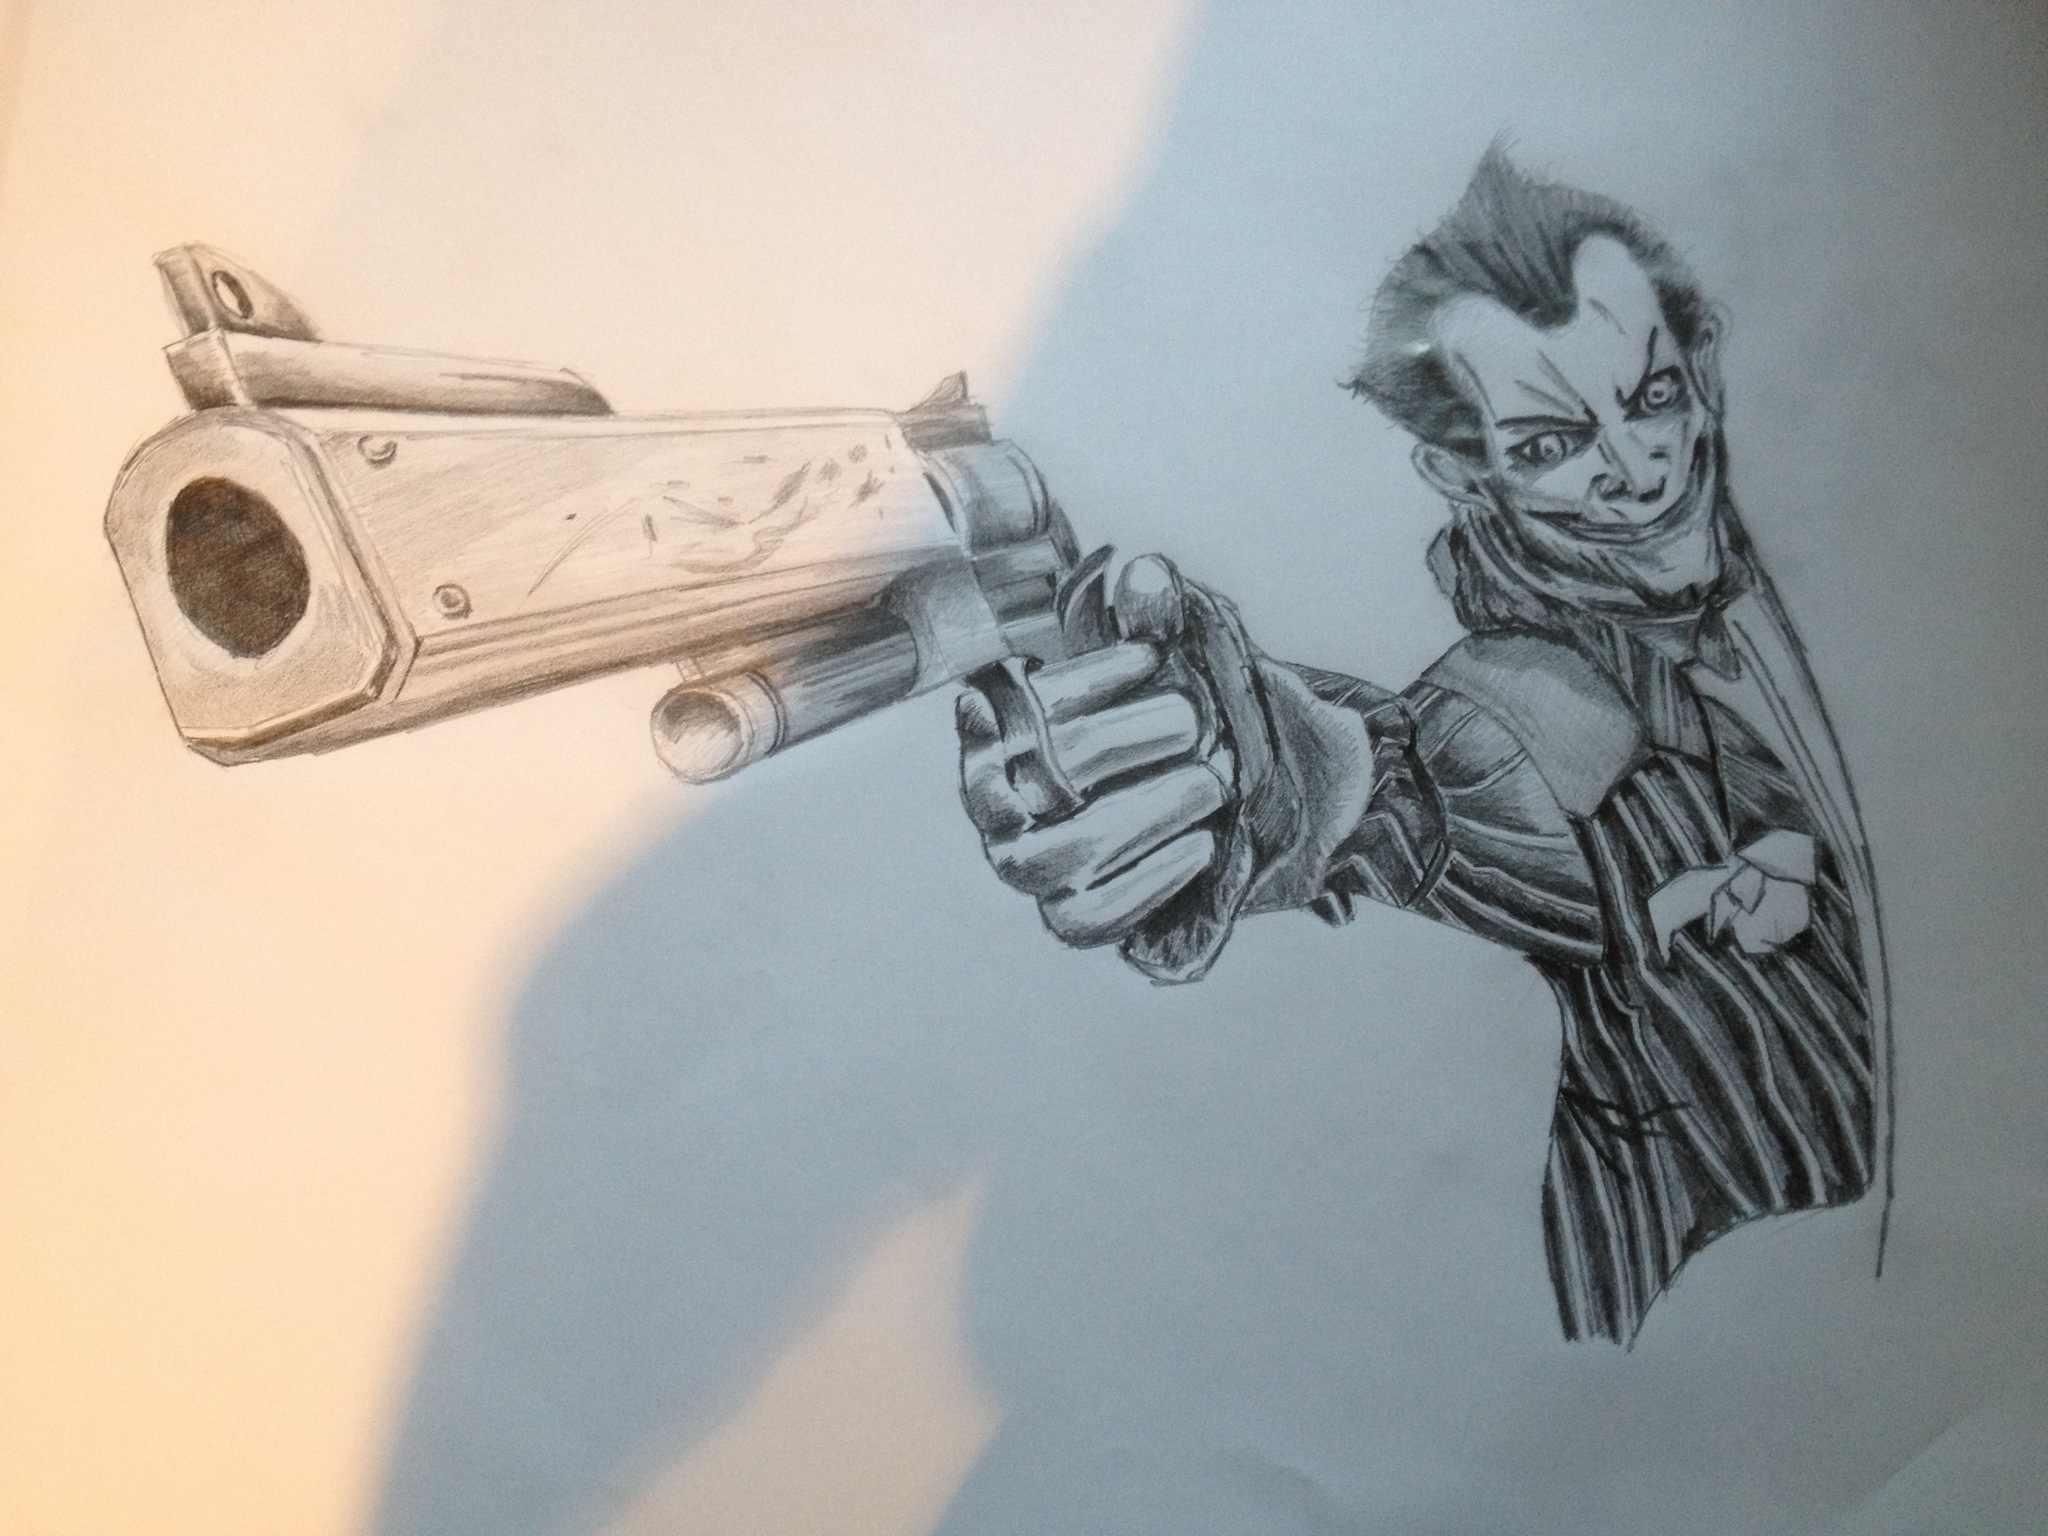 2048x1536 Love Drawing Comic Book Characters So Here's The Joker Joker